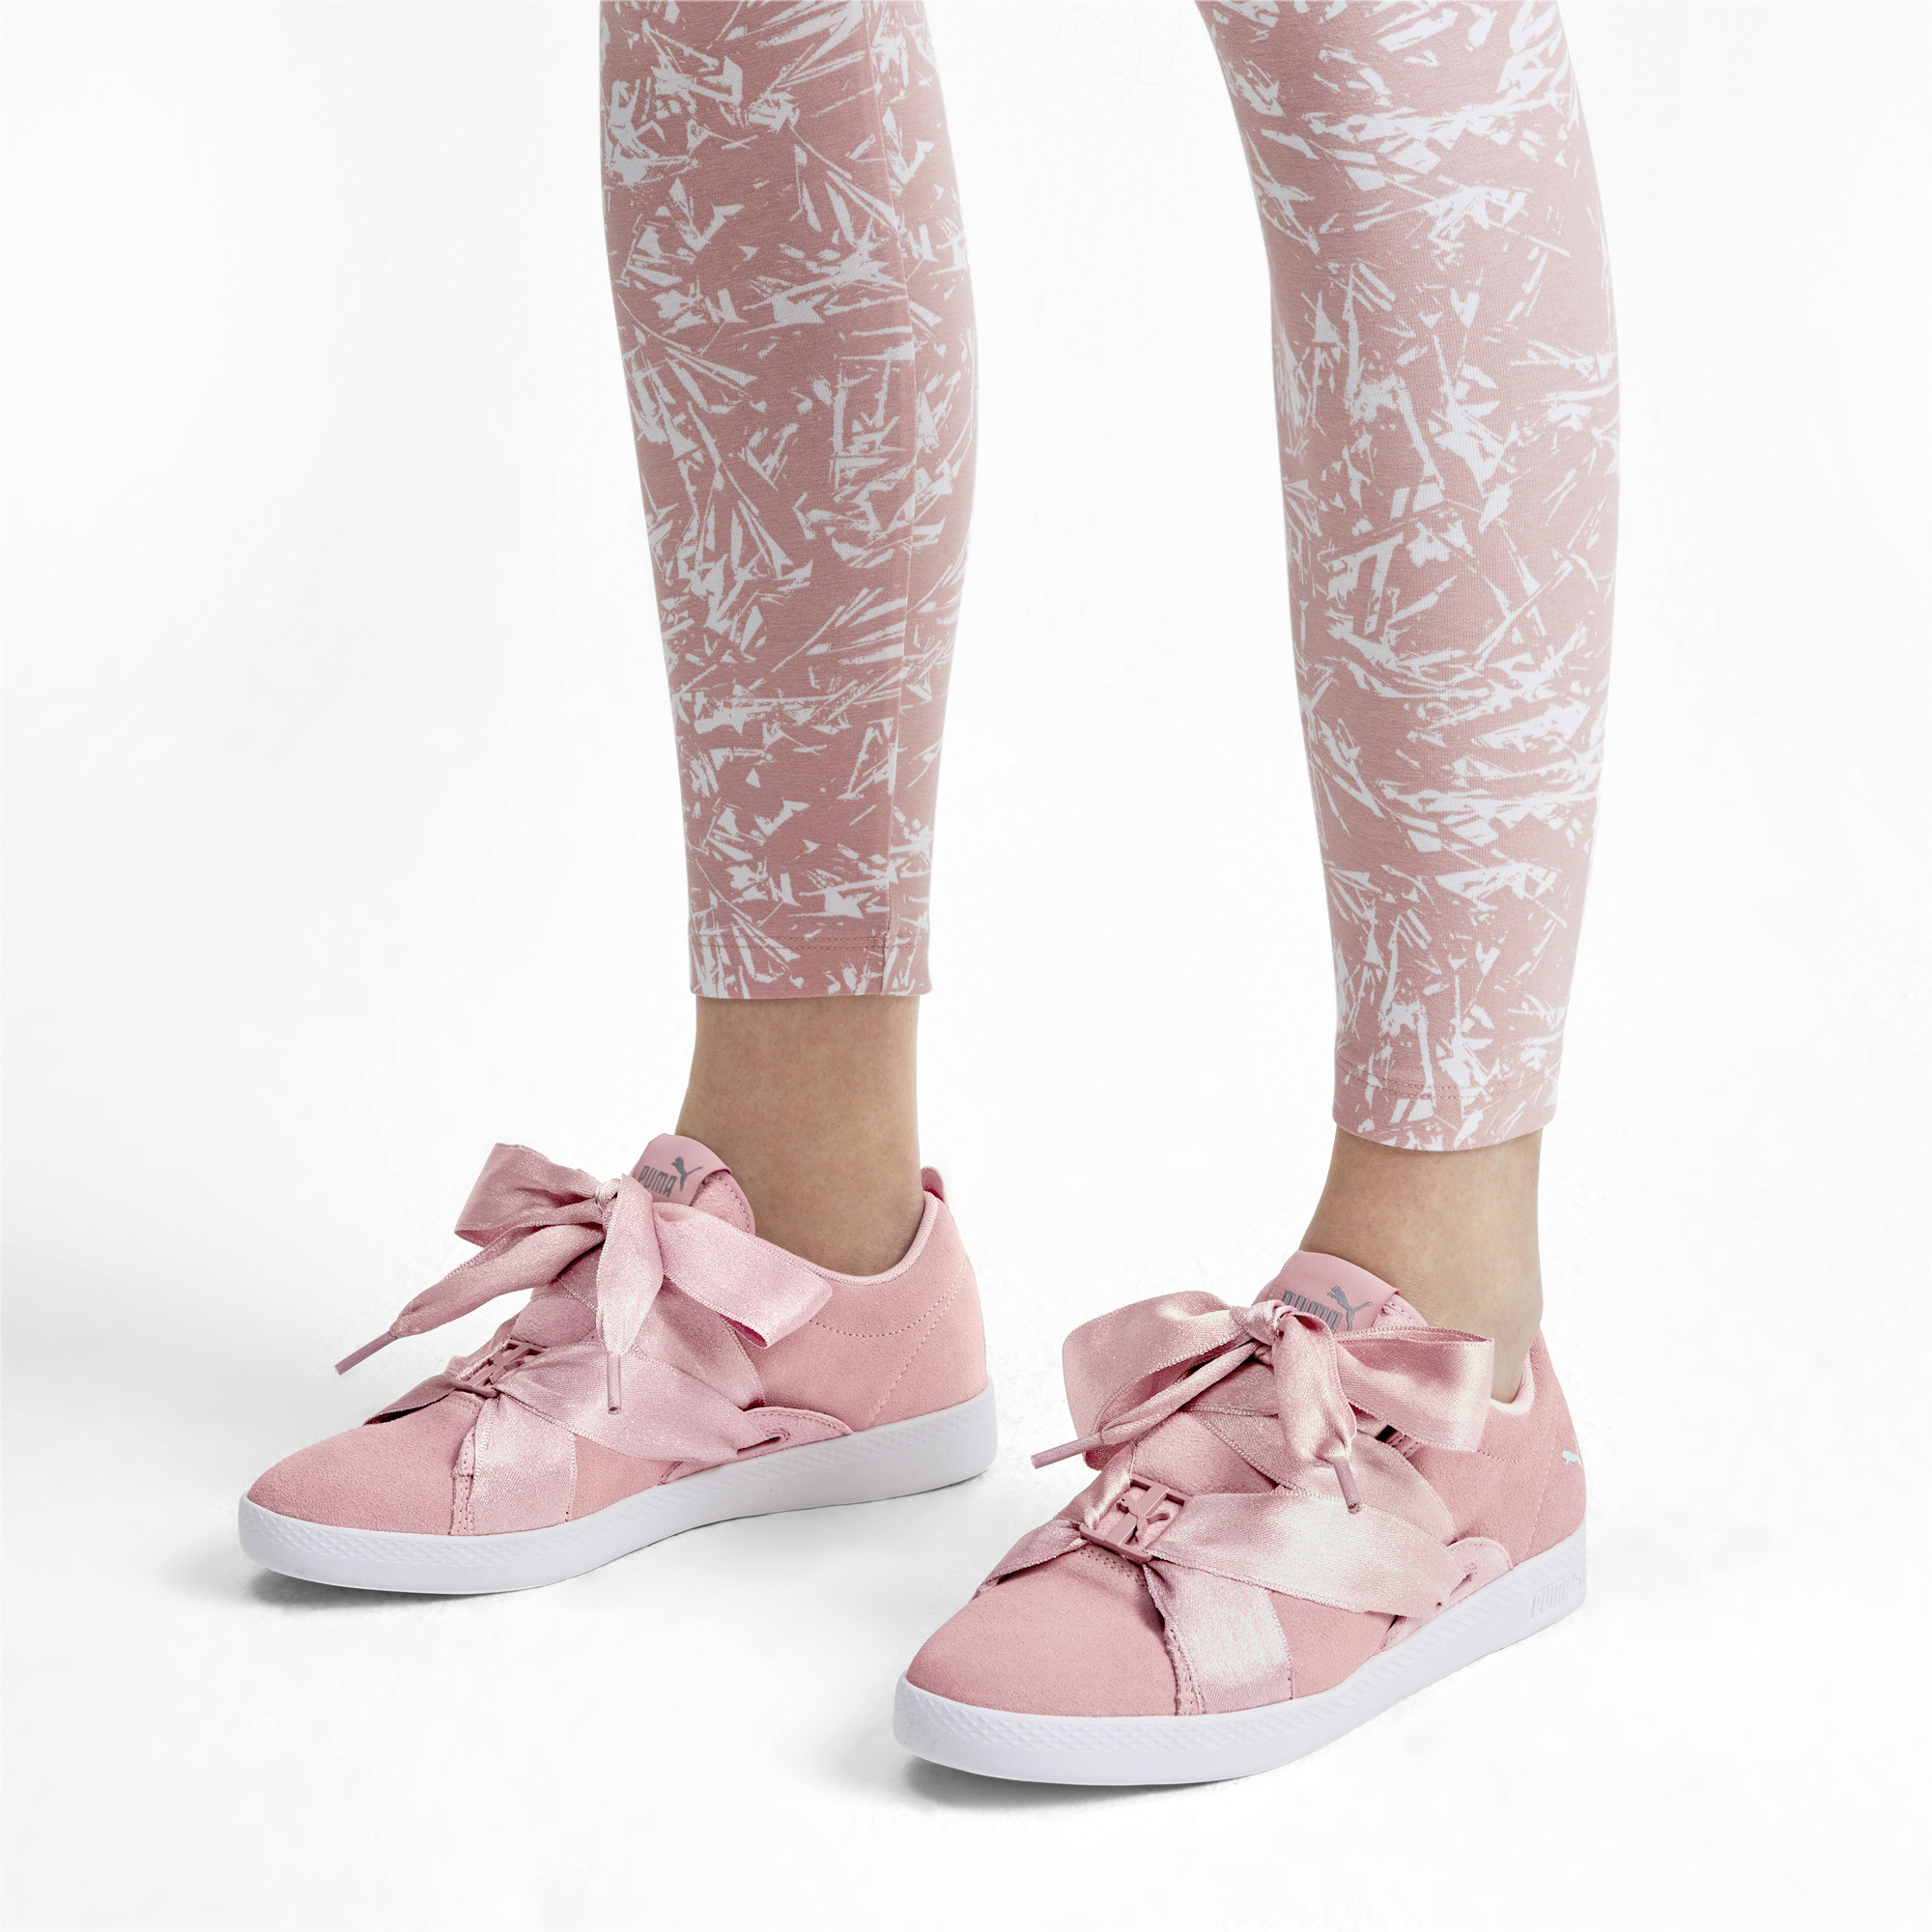 PUMA-PUMA-Smash-Astral-Buckle-Women-s-Sneakers-Women-Shoe-Basics thumbnail 5